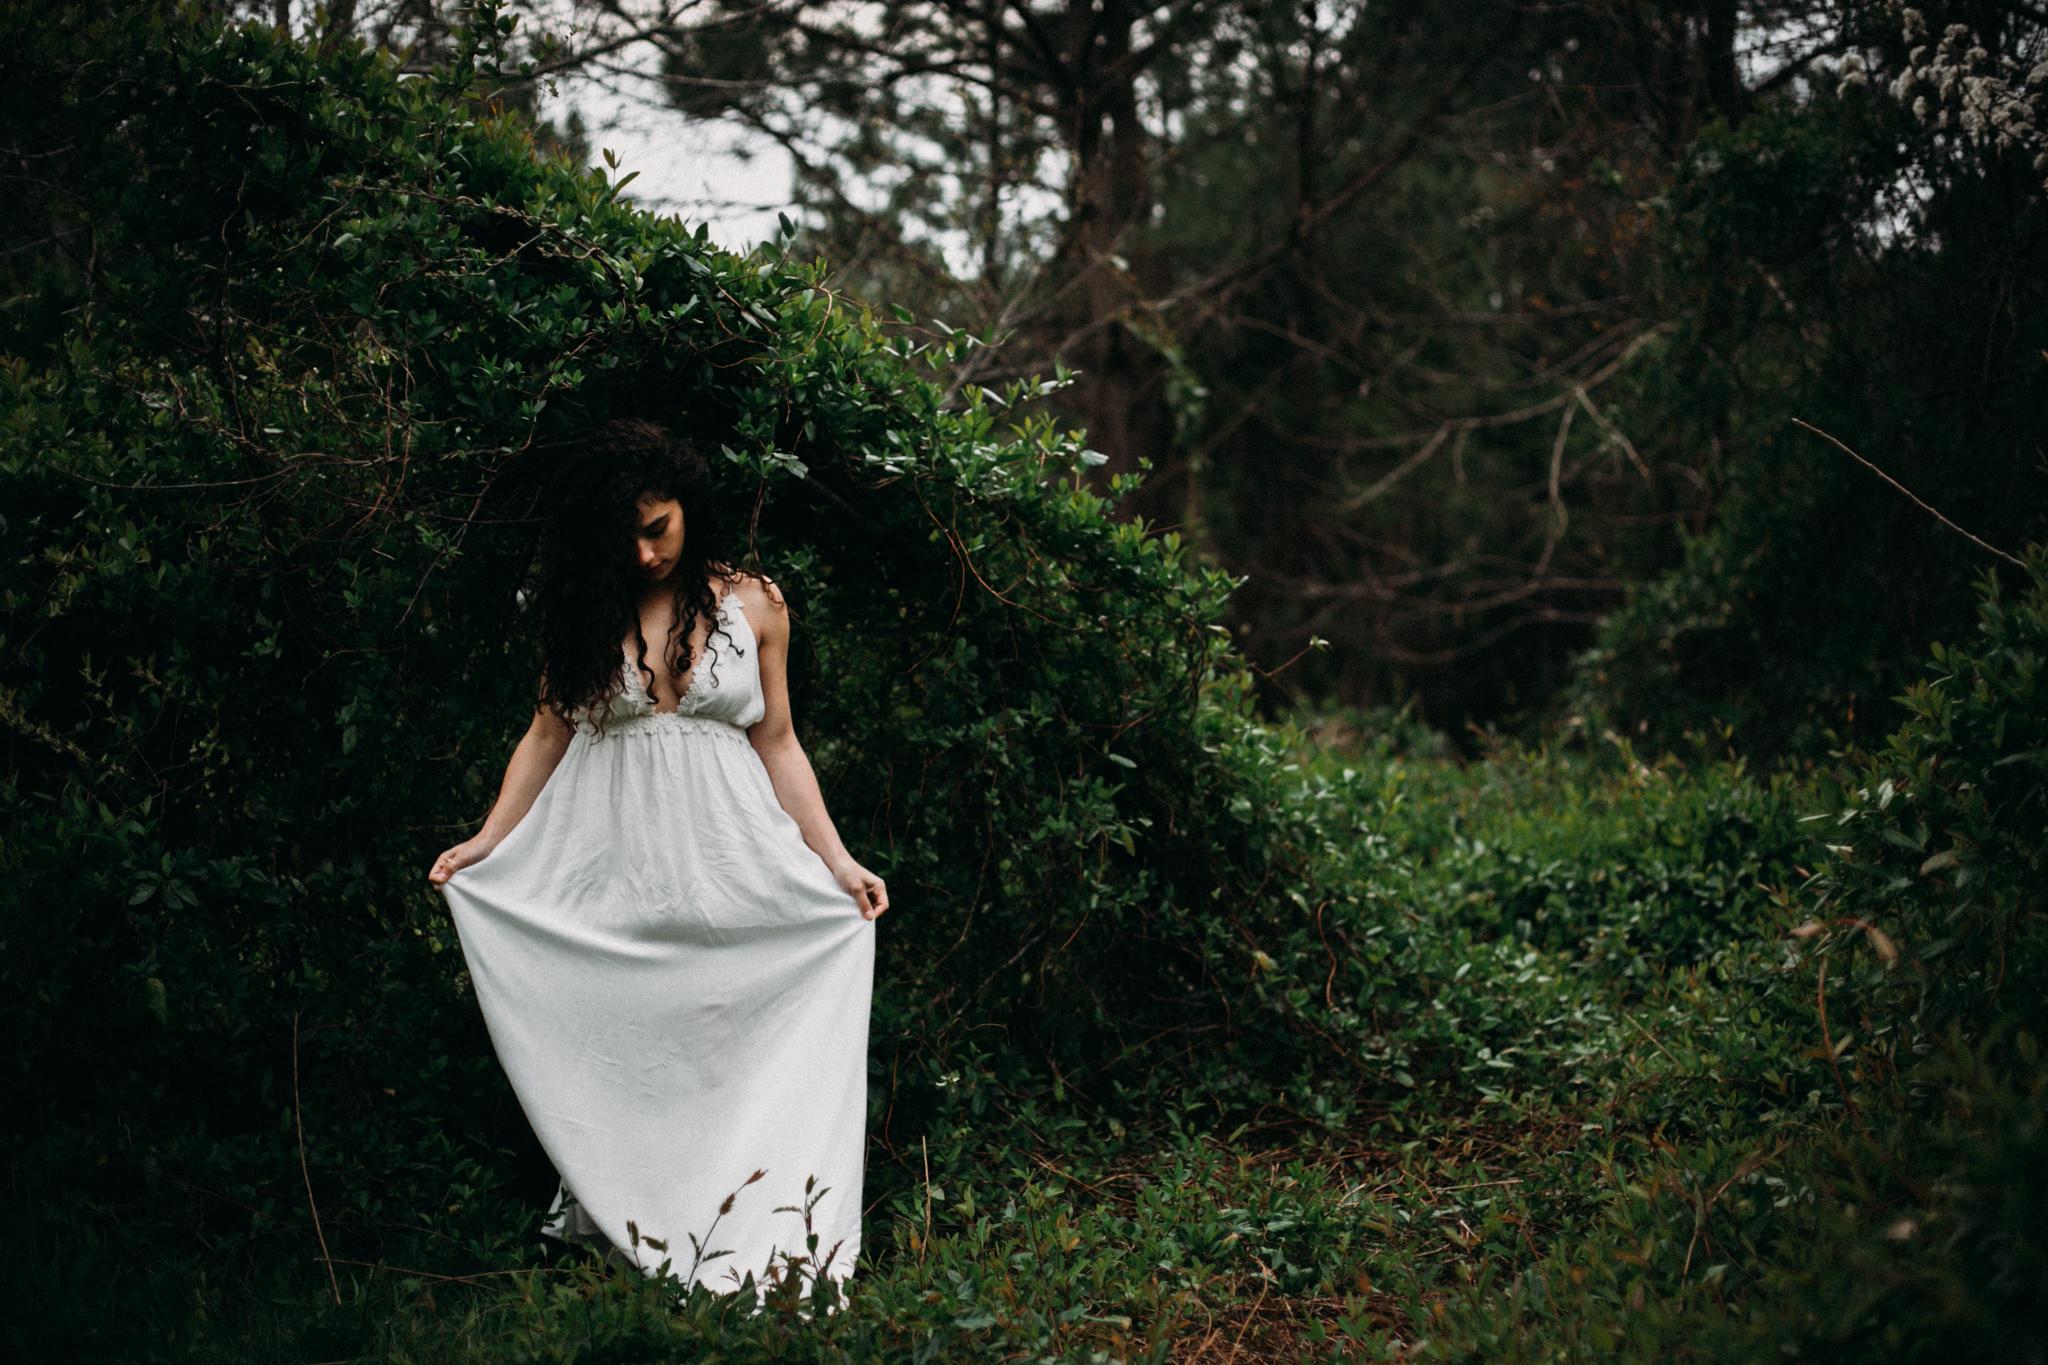 Jessica.VirginiaBeach.Virginia.Boudoir.emotivestorytelling-38.JPG